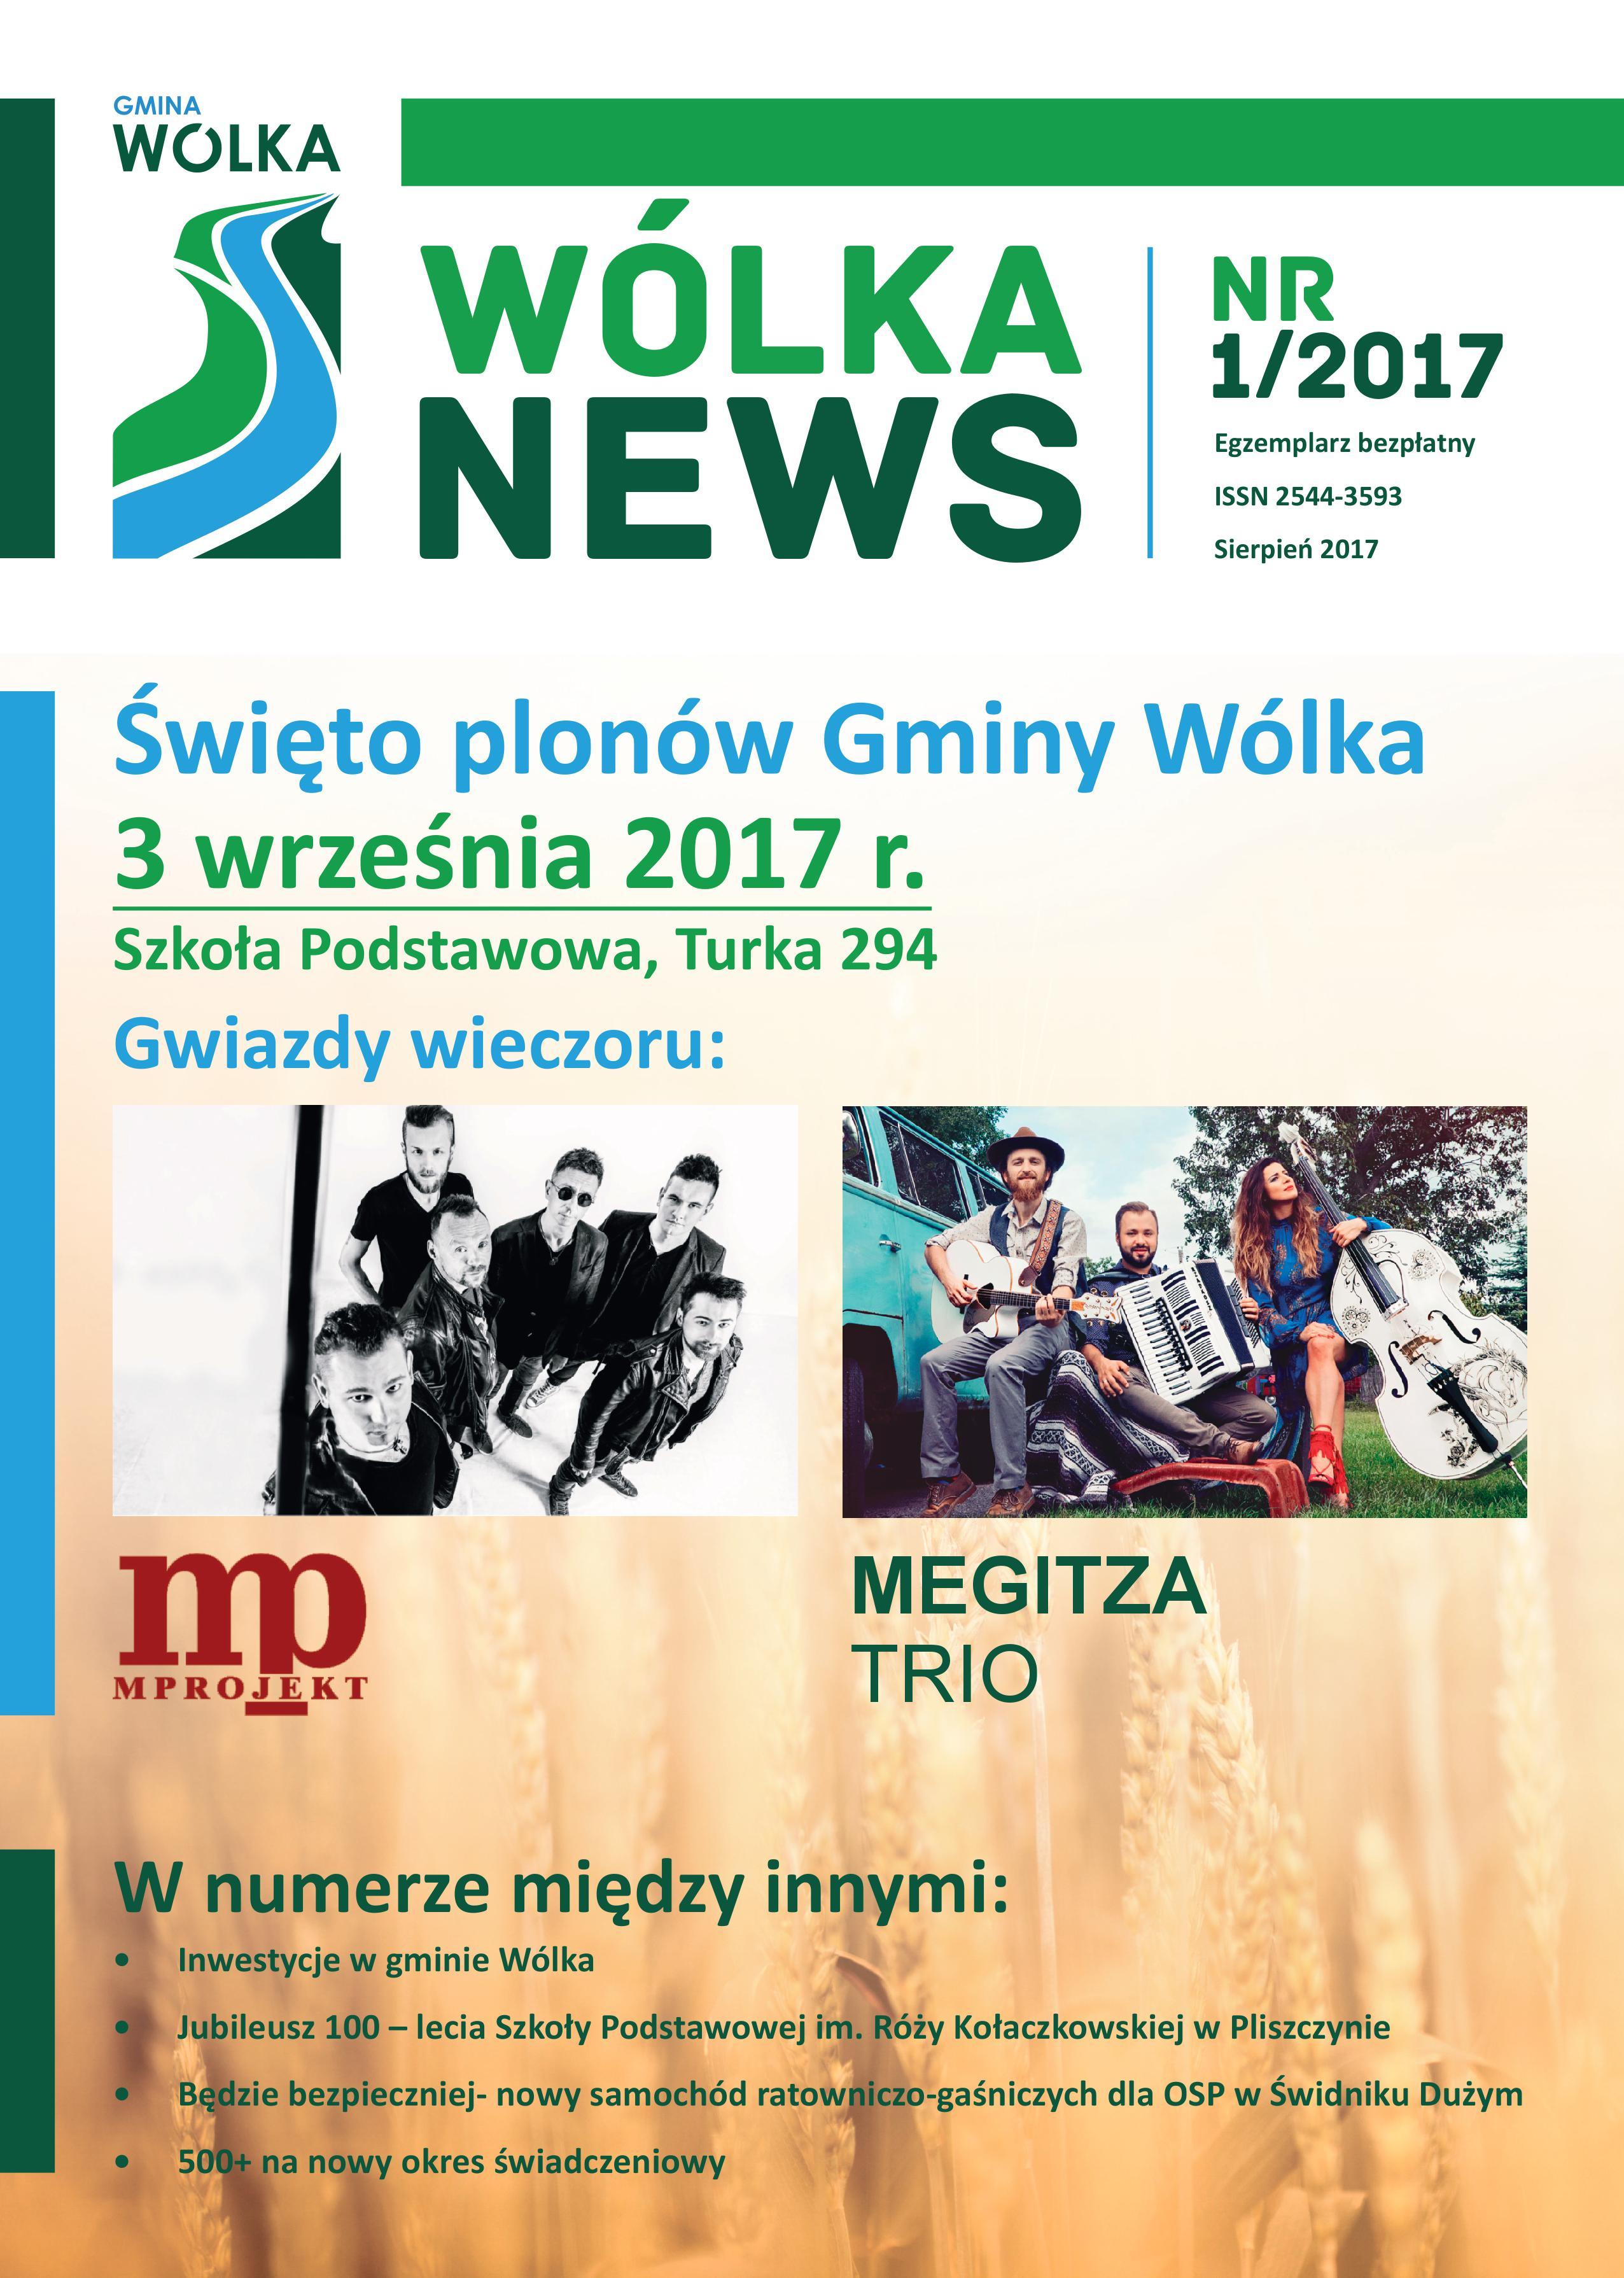 https://issuu.com/gminawolka/docs/w__lka_news__1_2017